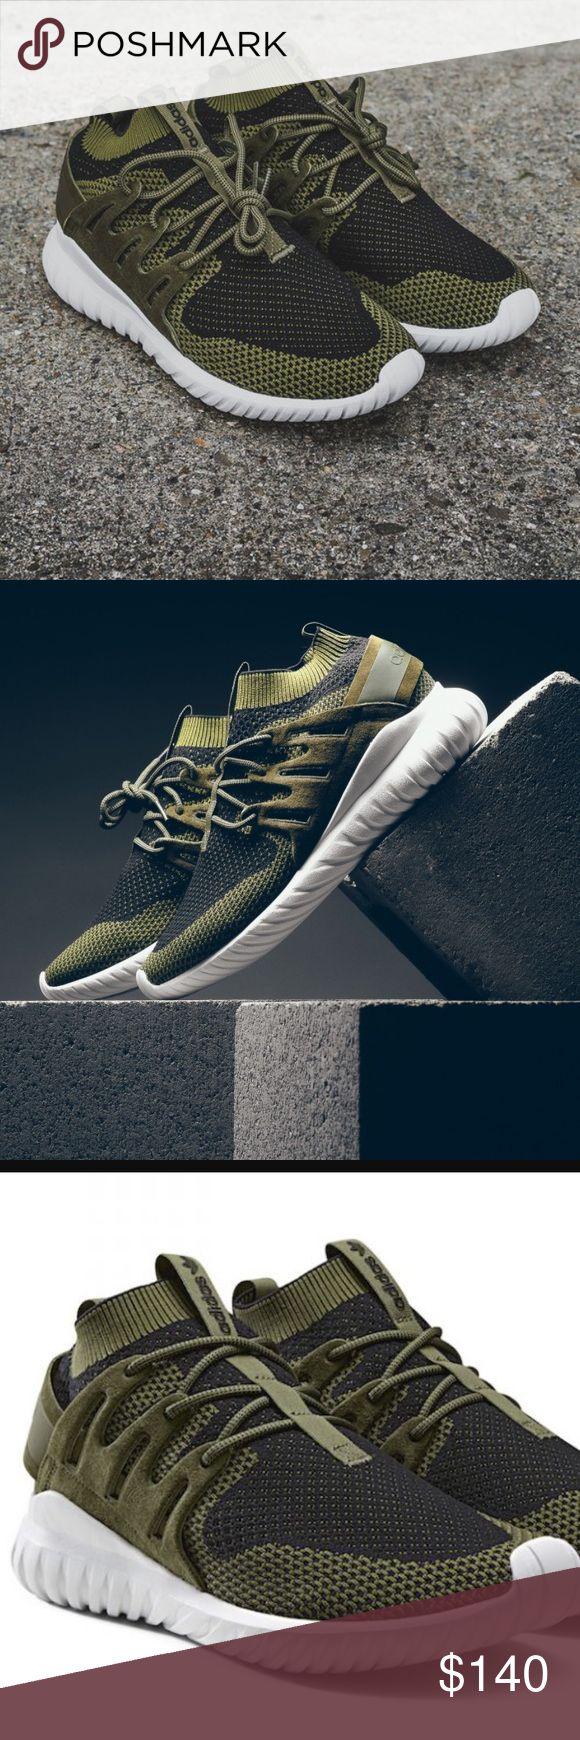 Adidas tubular nova prime knit men Brand new adidas tubular nova prime knit size 12 men Adidas Shoes Sneakers